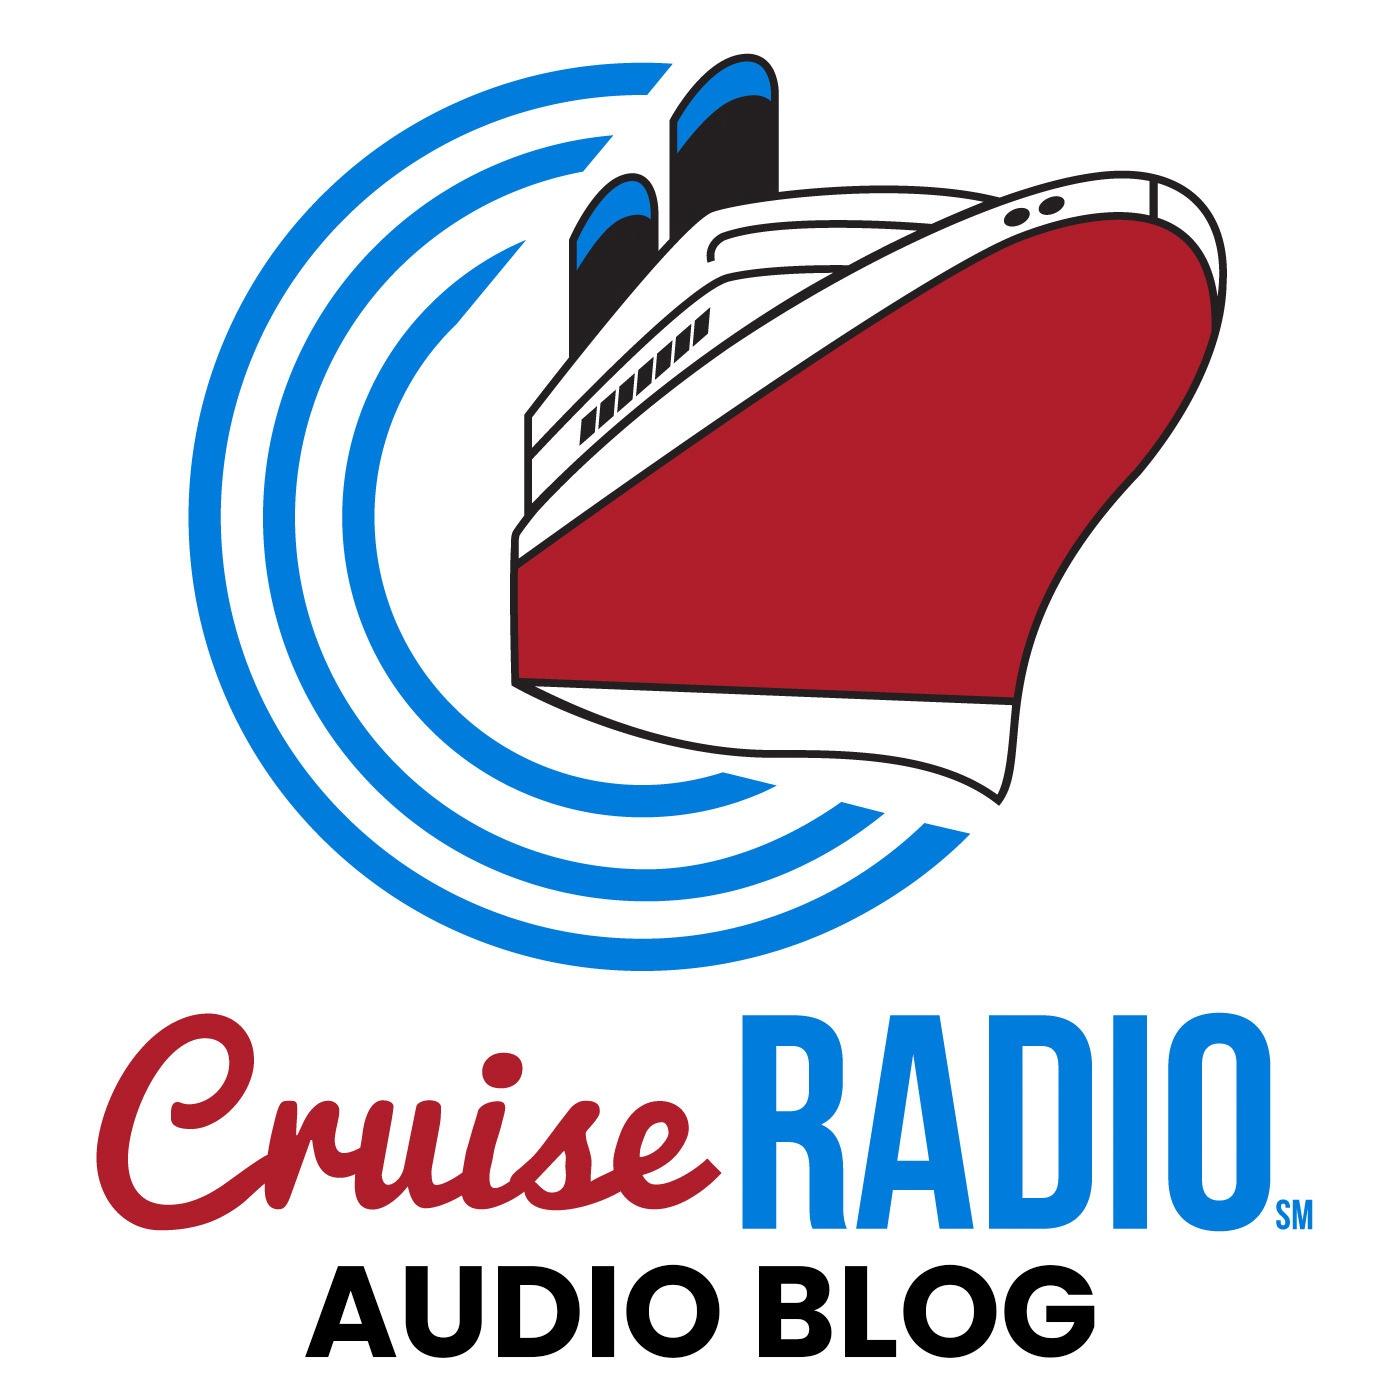 Cruise Radio Audio Blog show art